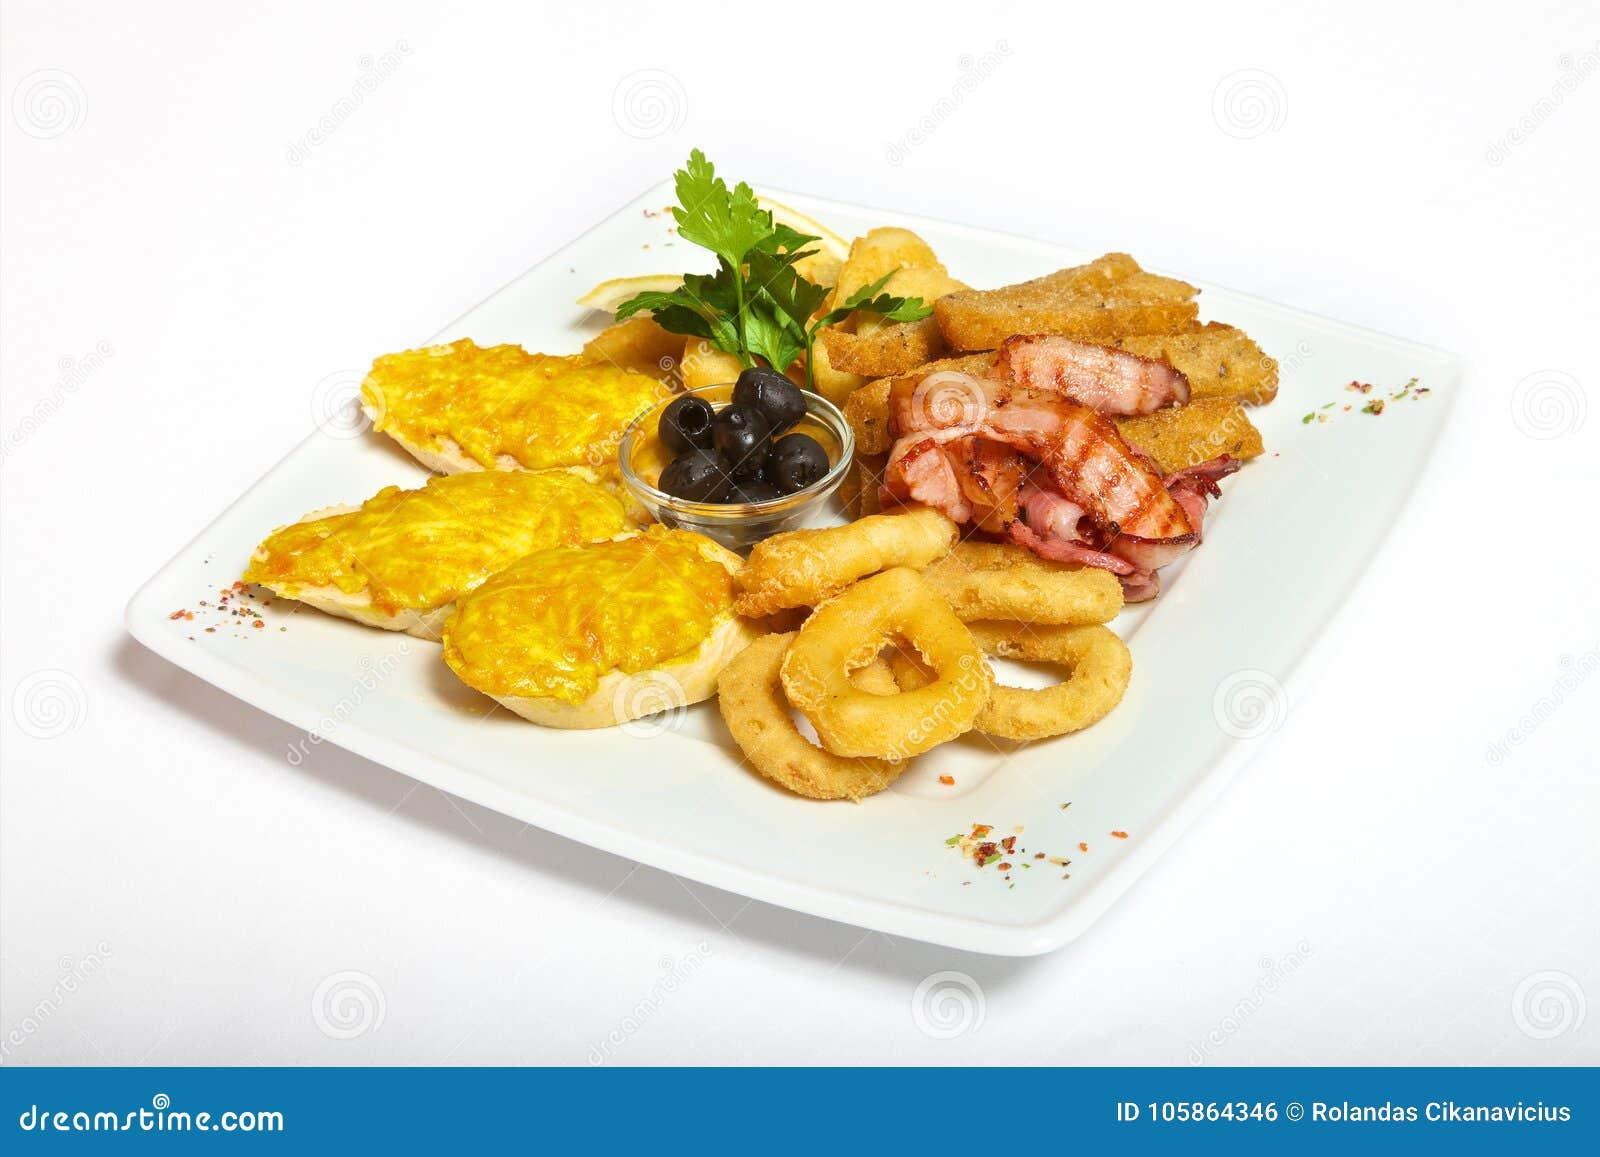 Assorted beer snacks on plate